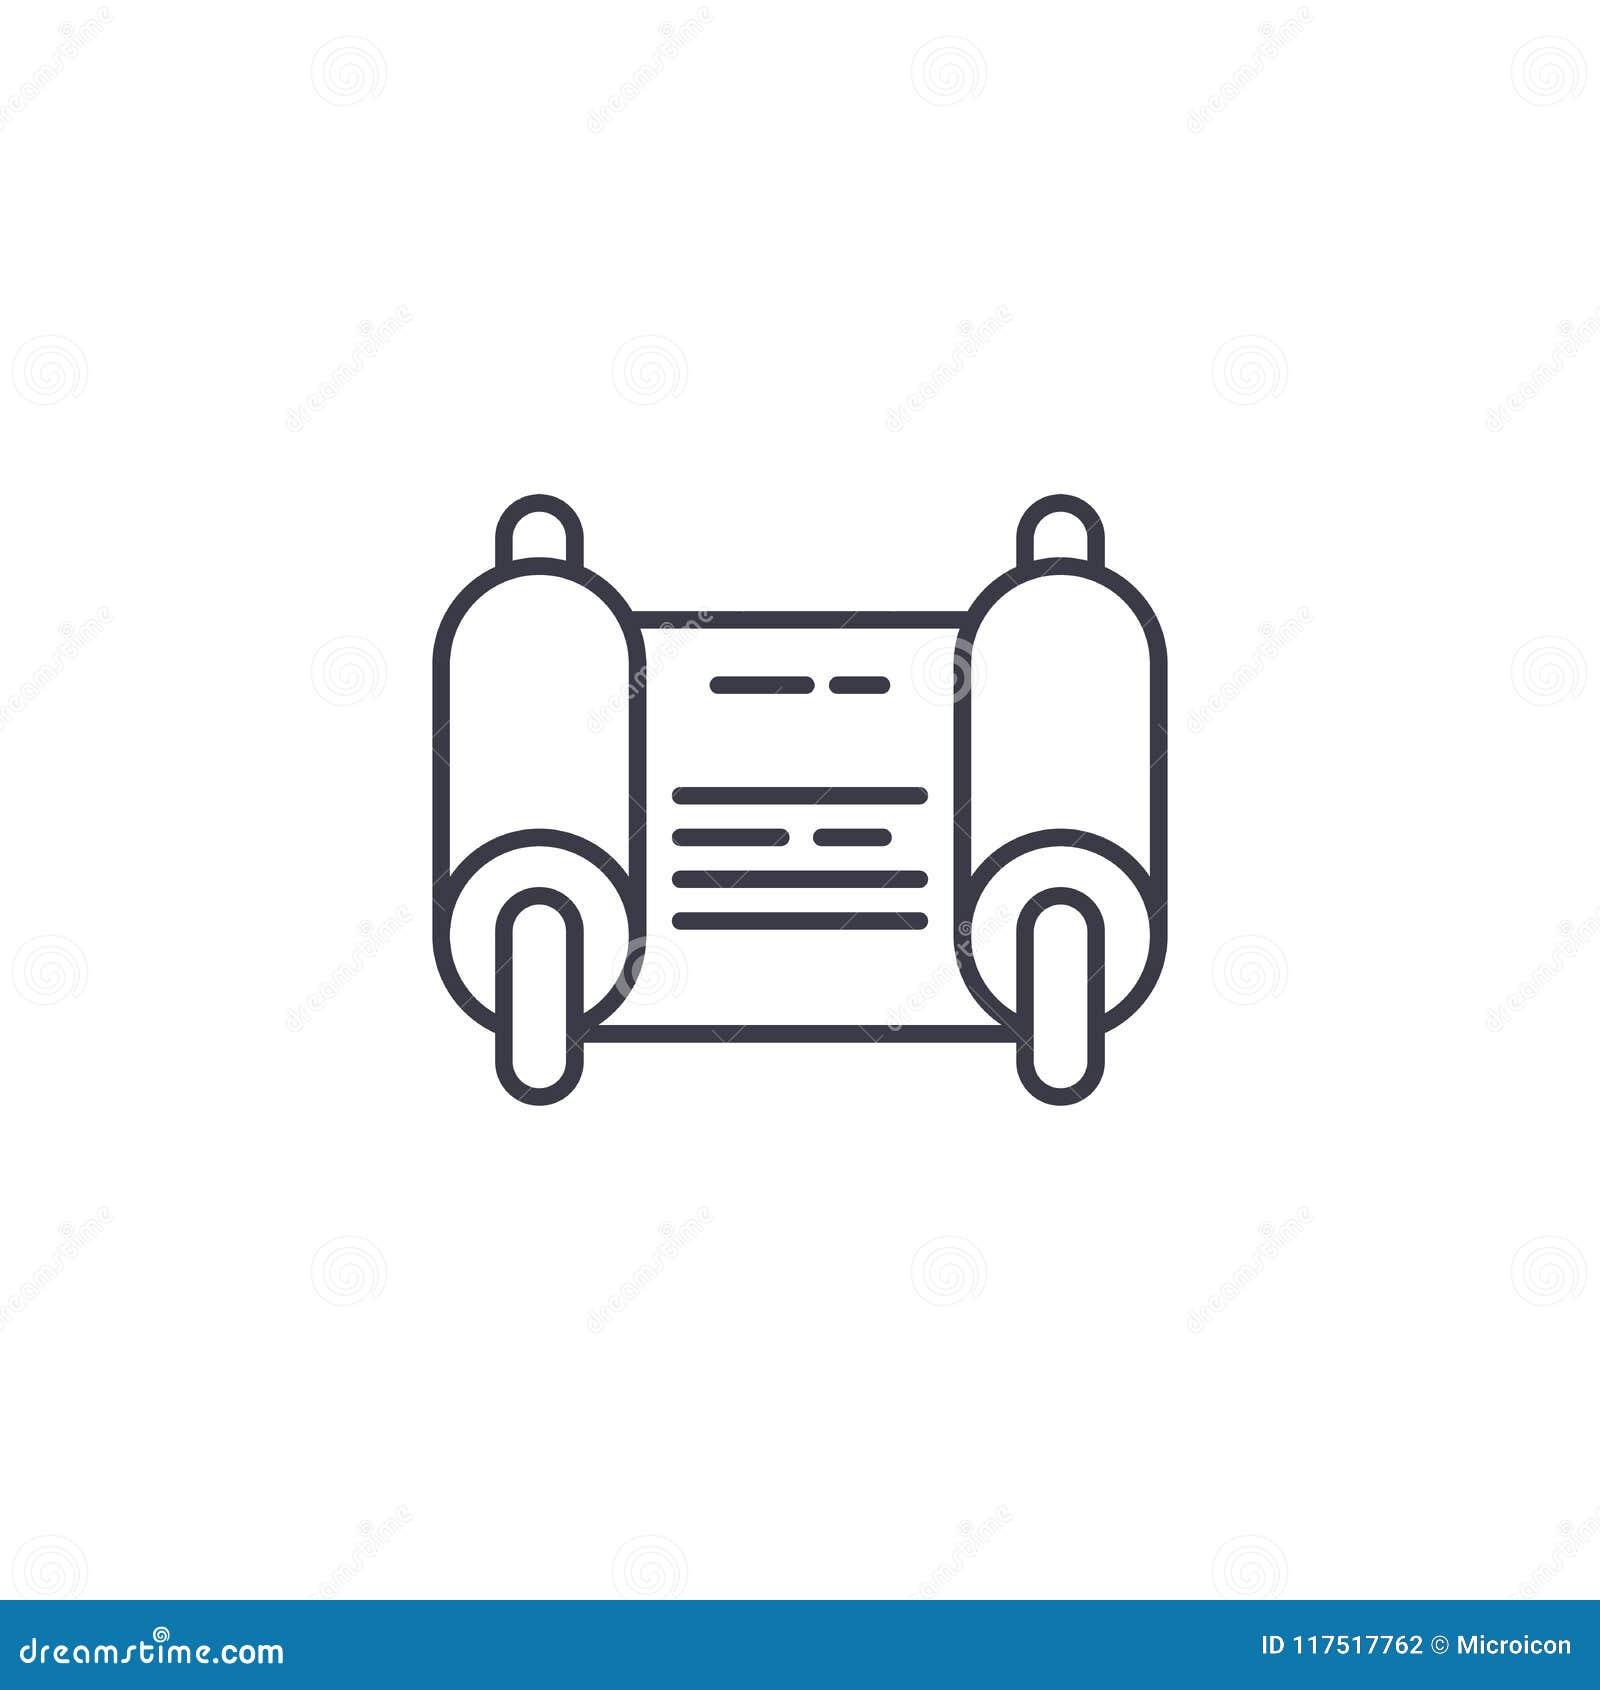 Fiat Linear Icon Concept Fiat Line Vector Sign Symbol